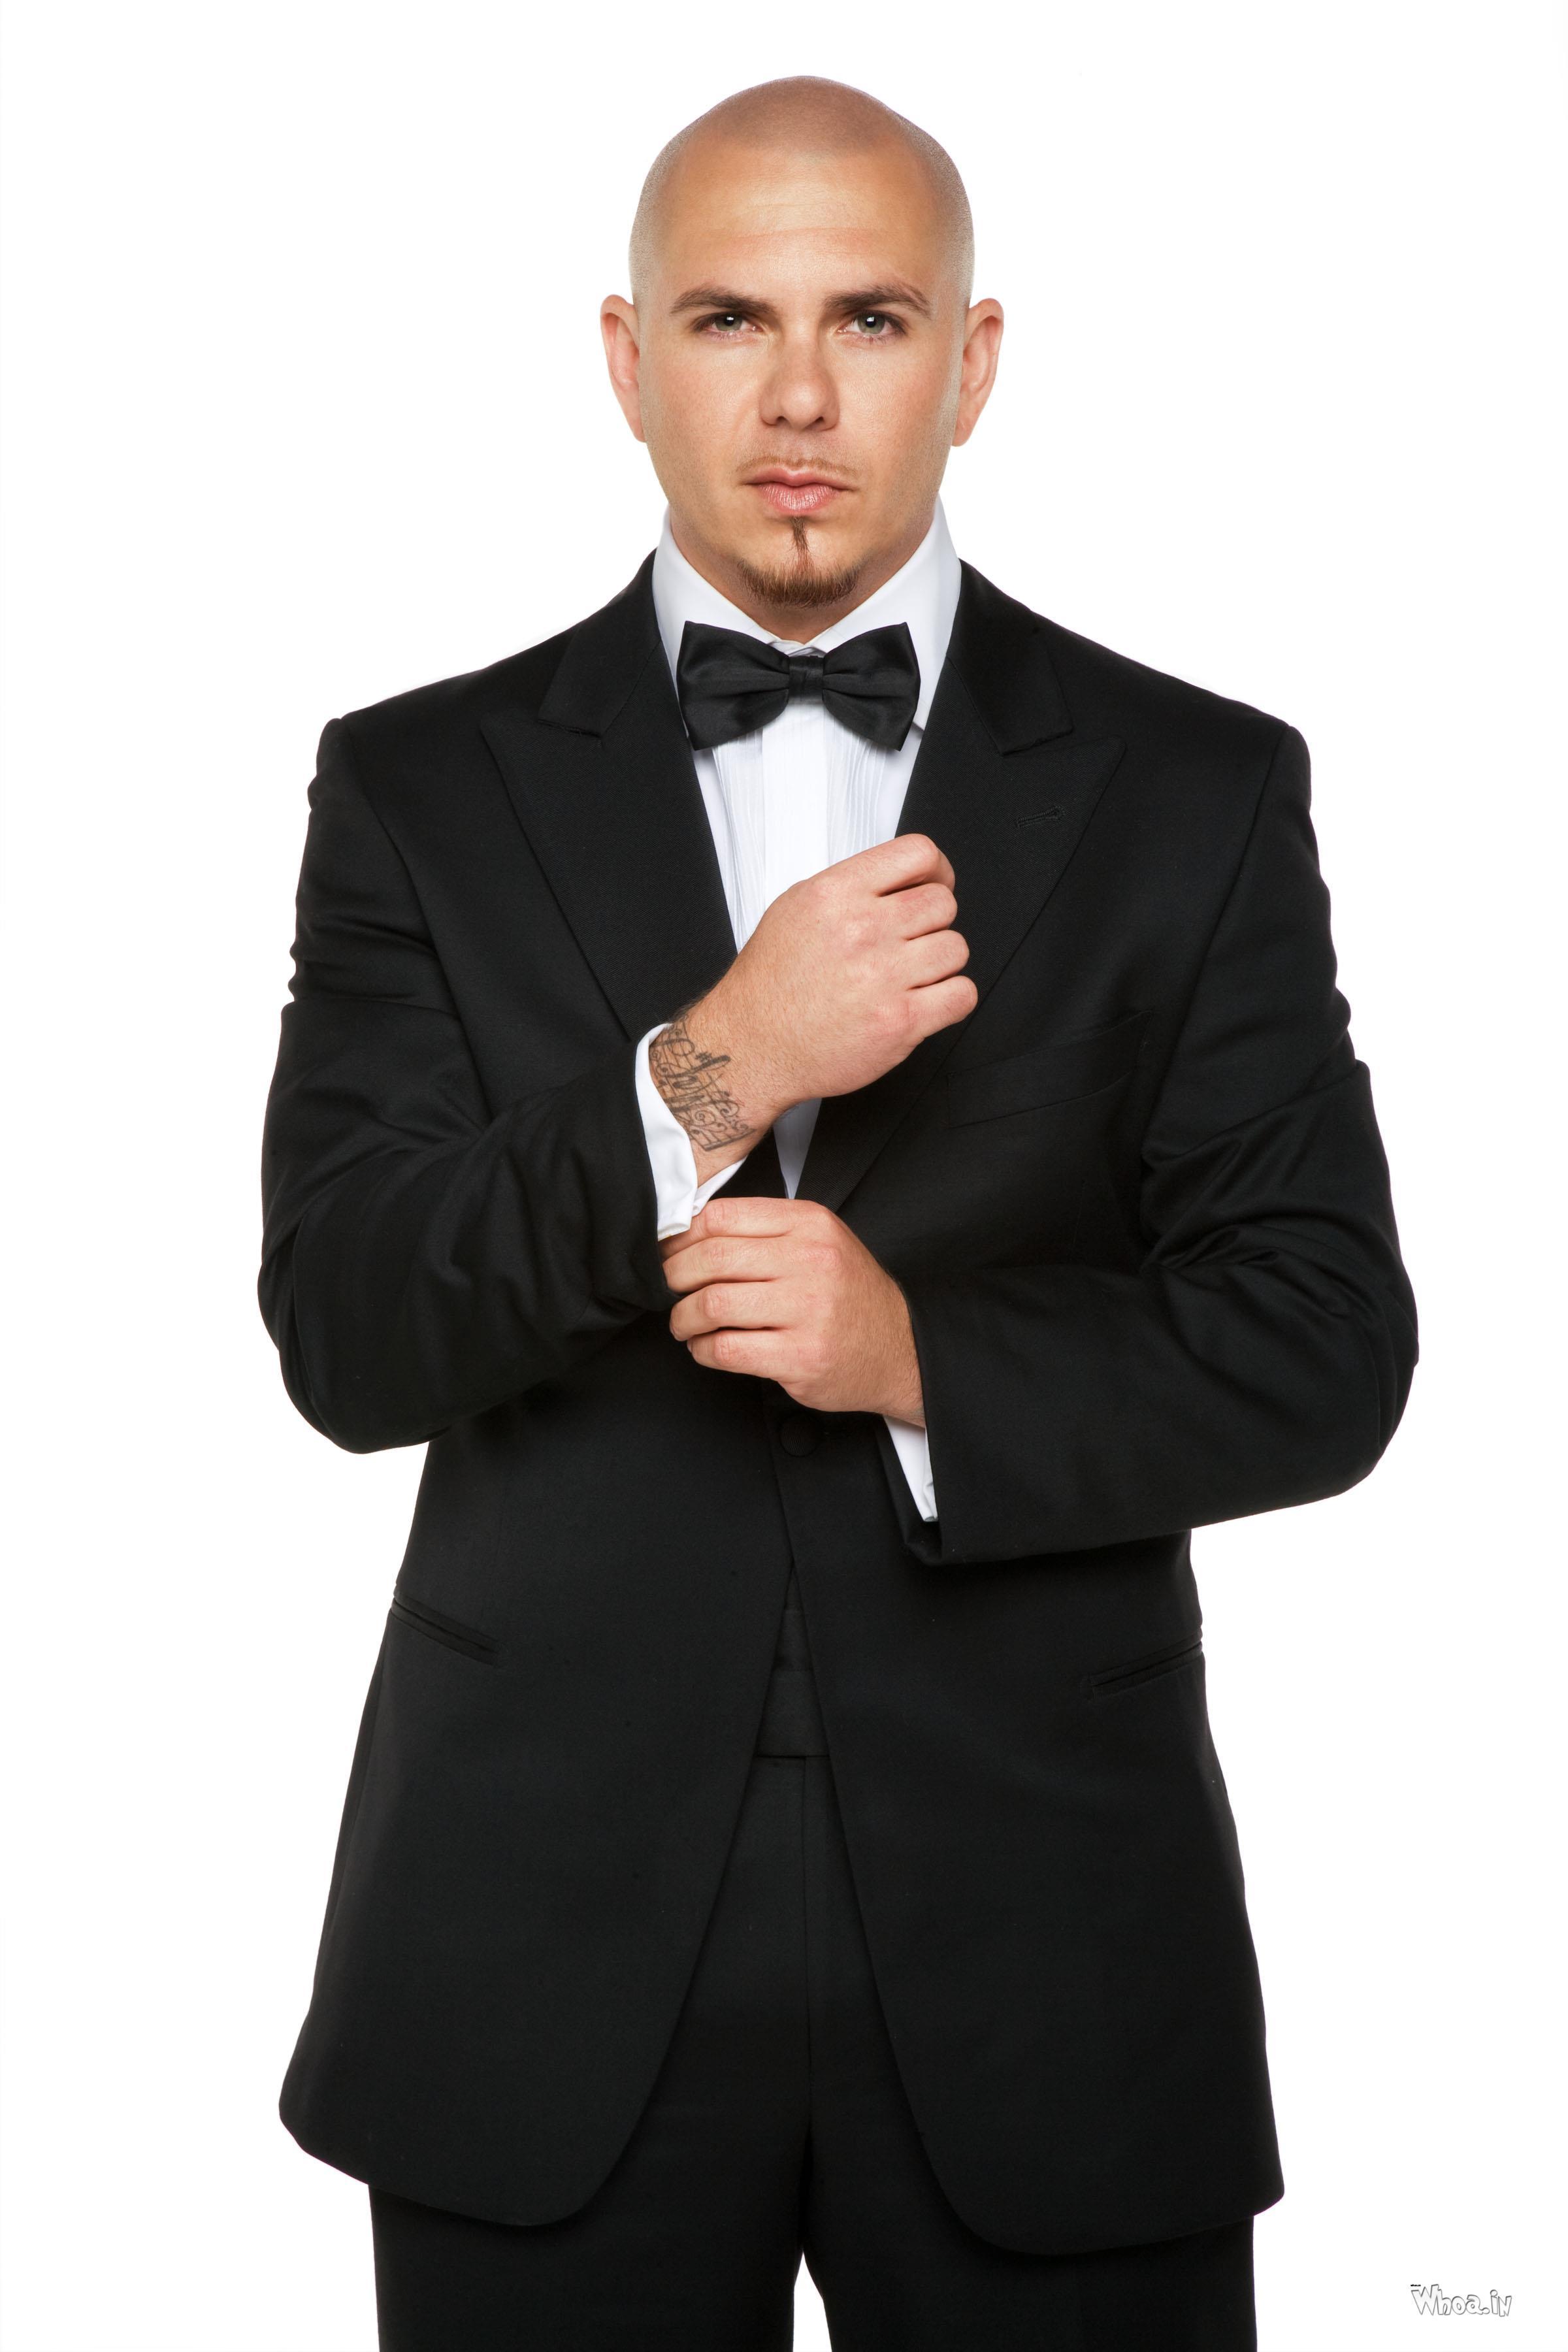 Pitbull In Black Suit Wallpaper